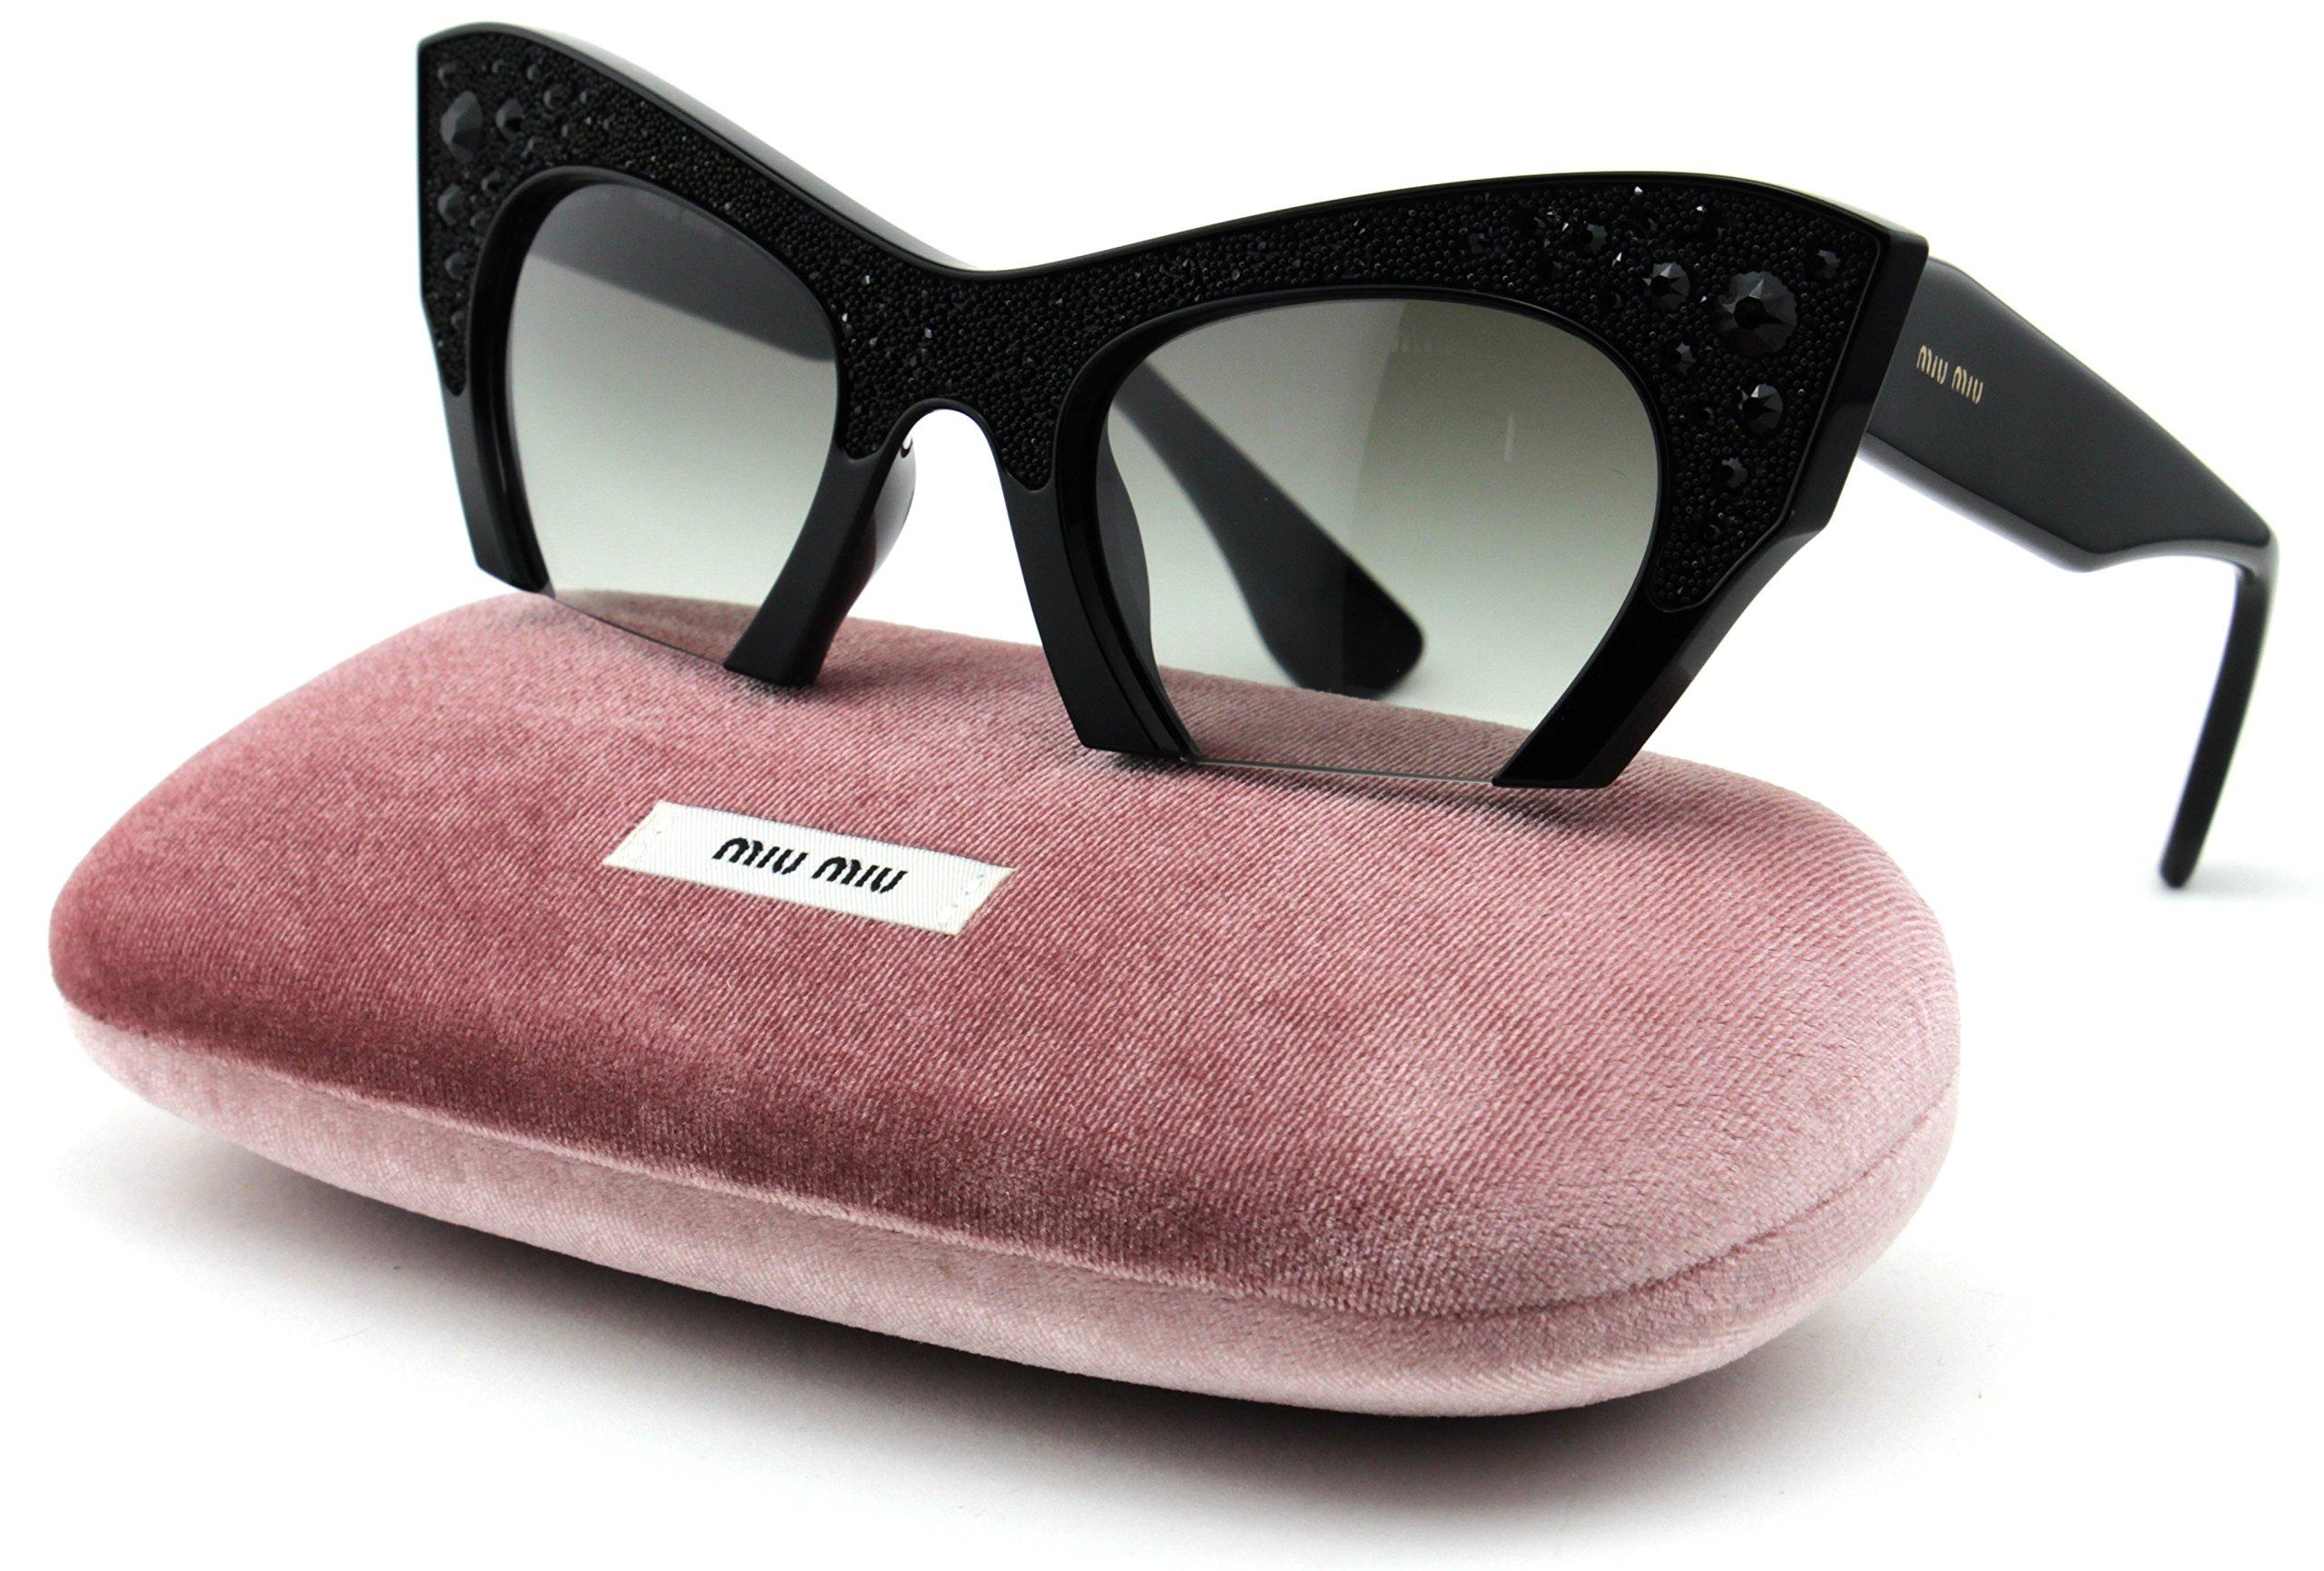 9b1eab9a004 Miu Miu Eyeglasses Frames Women Top Deals   Lowest Price ...